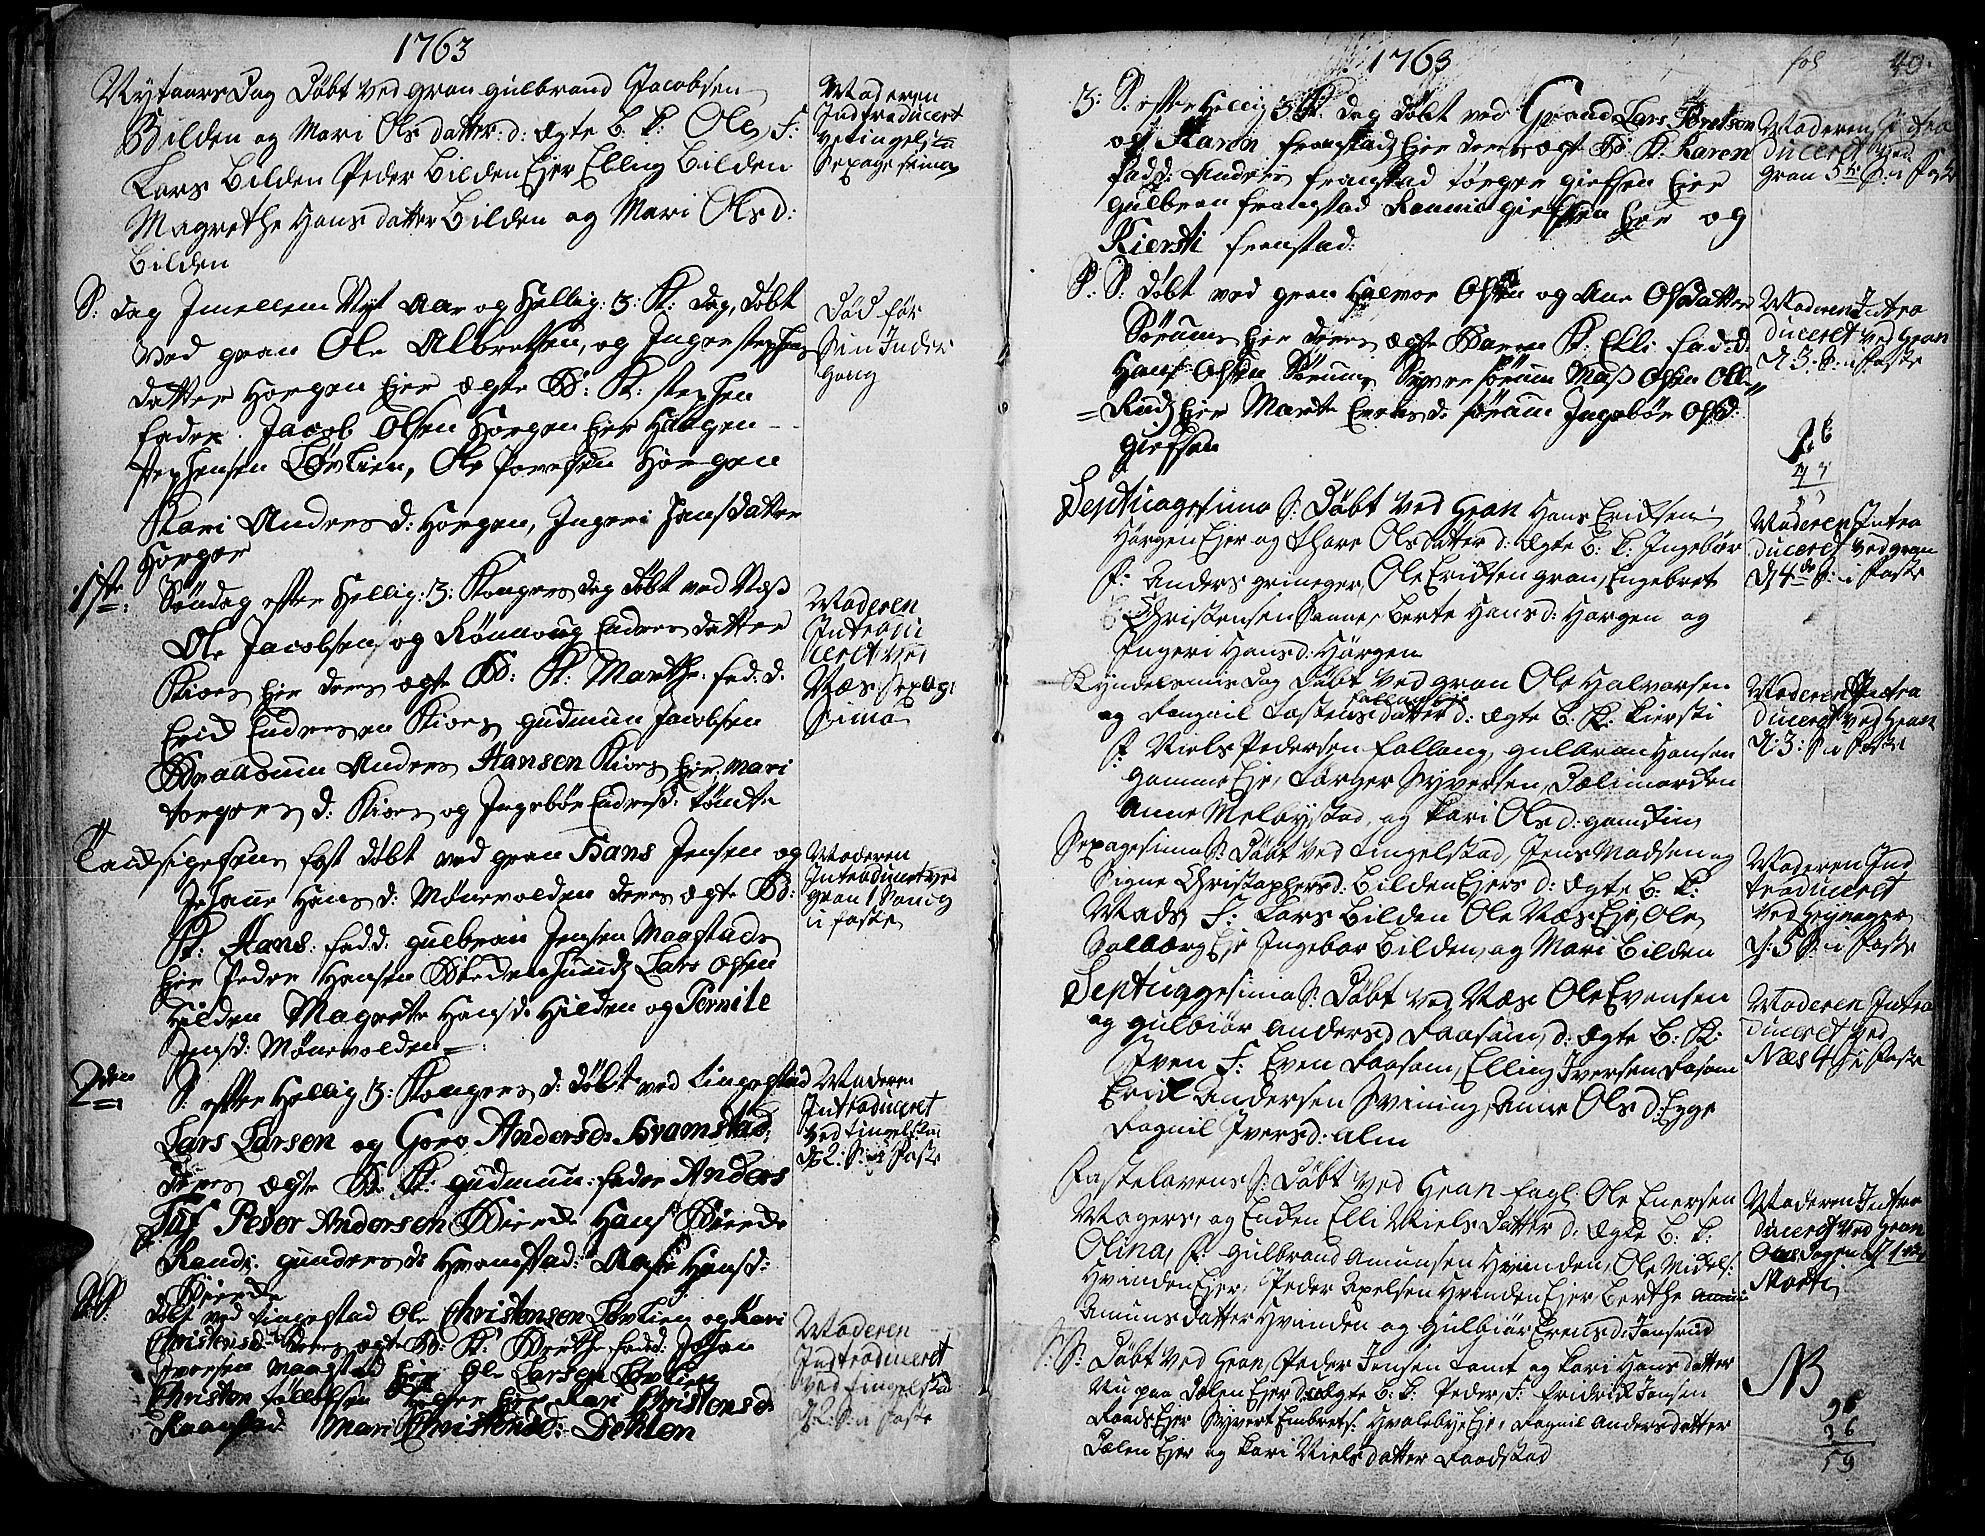 SAH, Gran prestekontor, Ministerialbok nr. 4, 1759-1775, s. 40